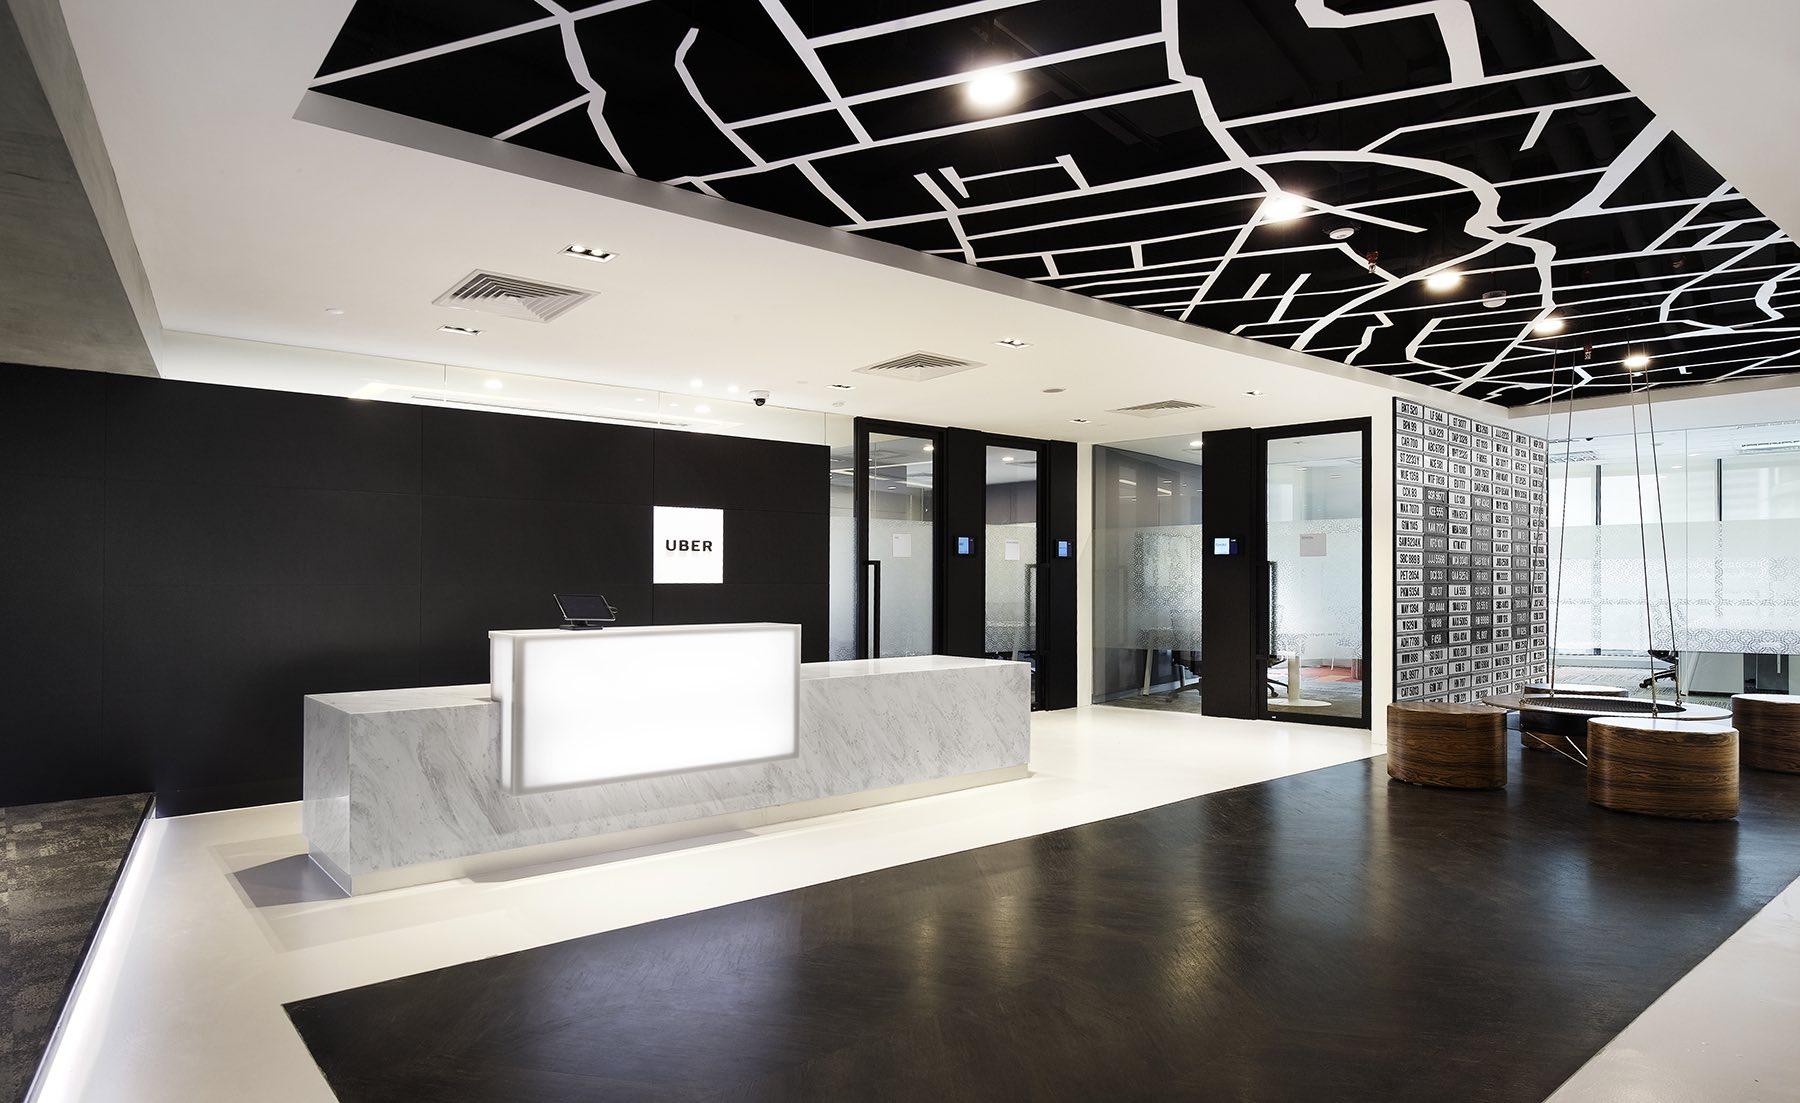 A Look Inside Uber's Kuala Lumpur Office